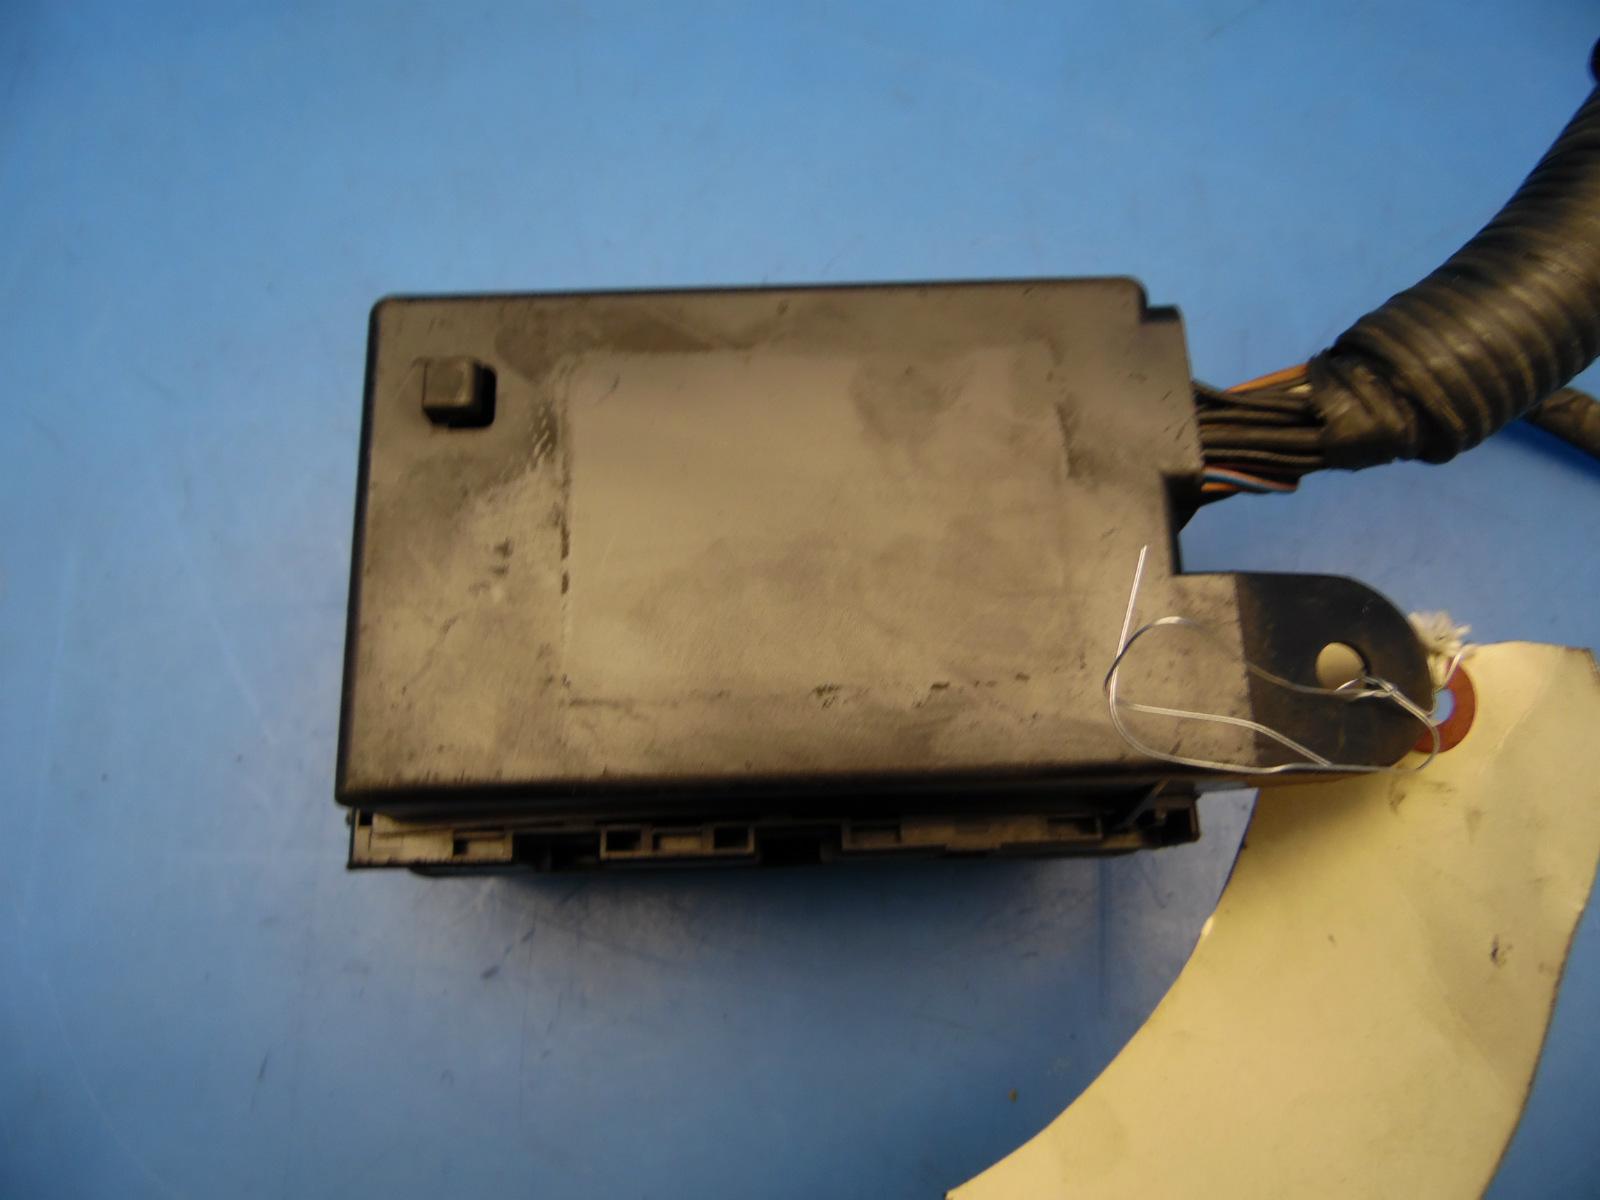 peugeot 106 zest fuse box wiring library peugeot 404 peugeot 106 zest 2 fuse box #14